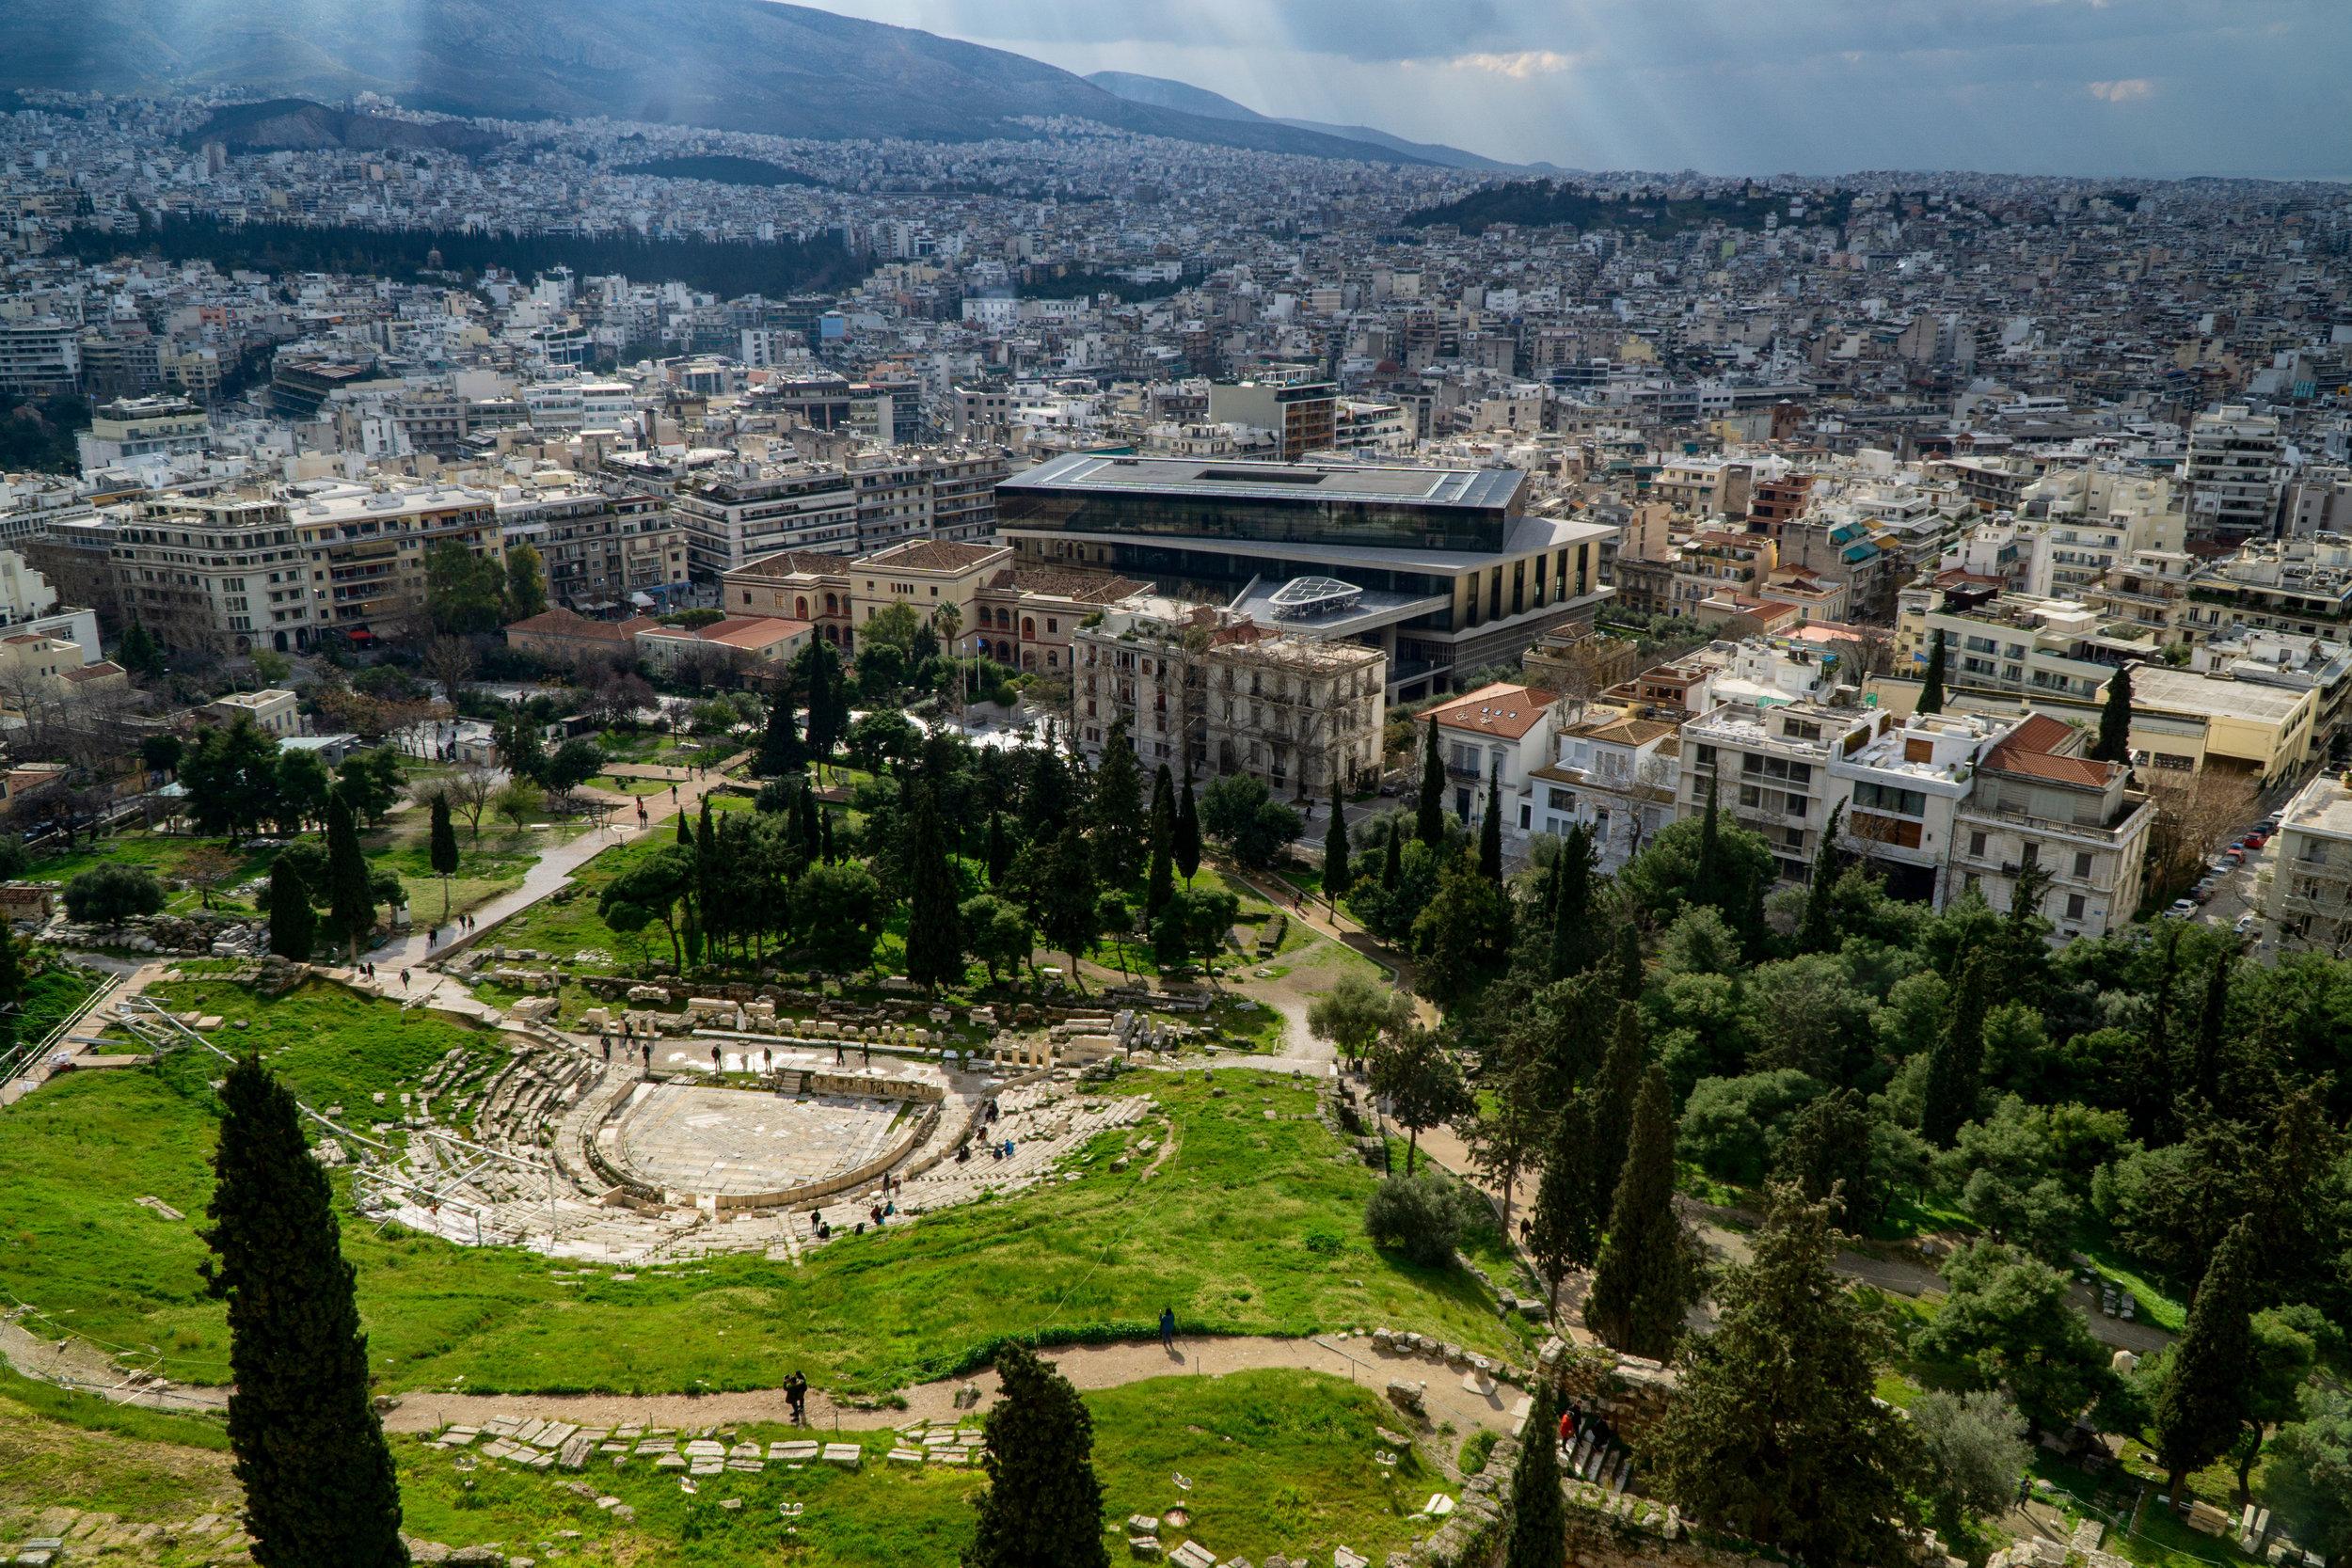 athens_acropolis_vickygood_travel_photography9sm.jpg